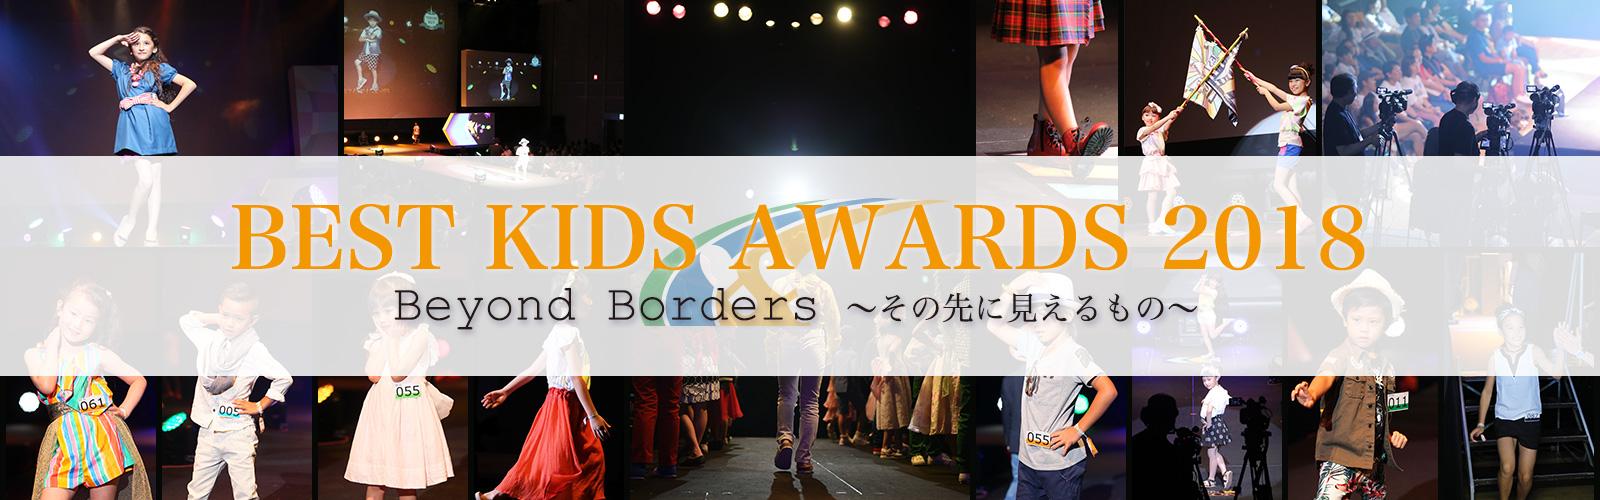 BEST KIDS AWARDS 2018